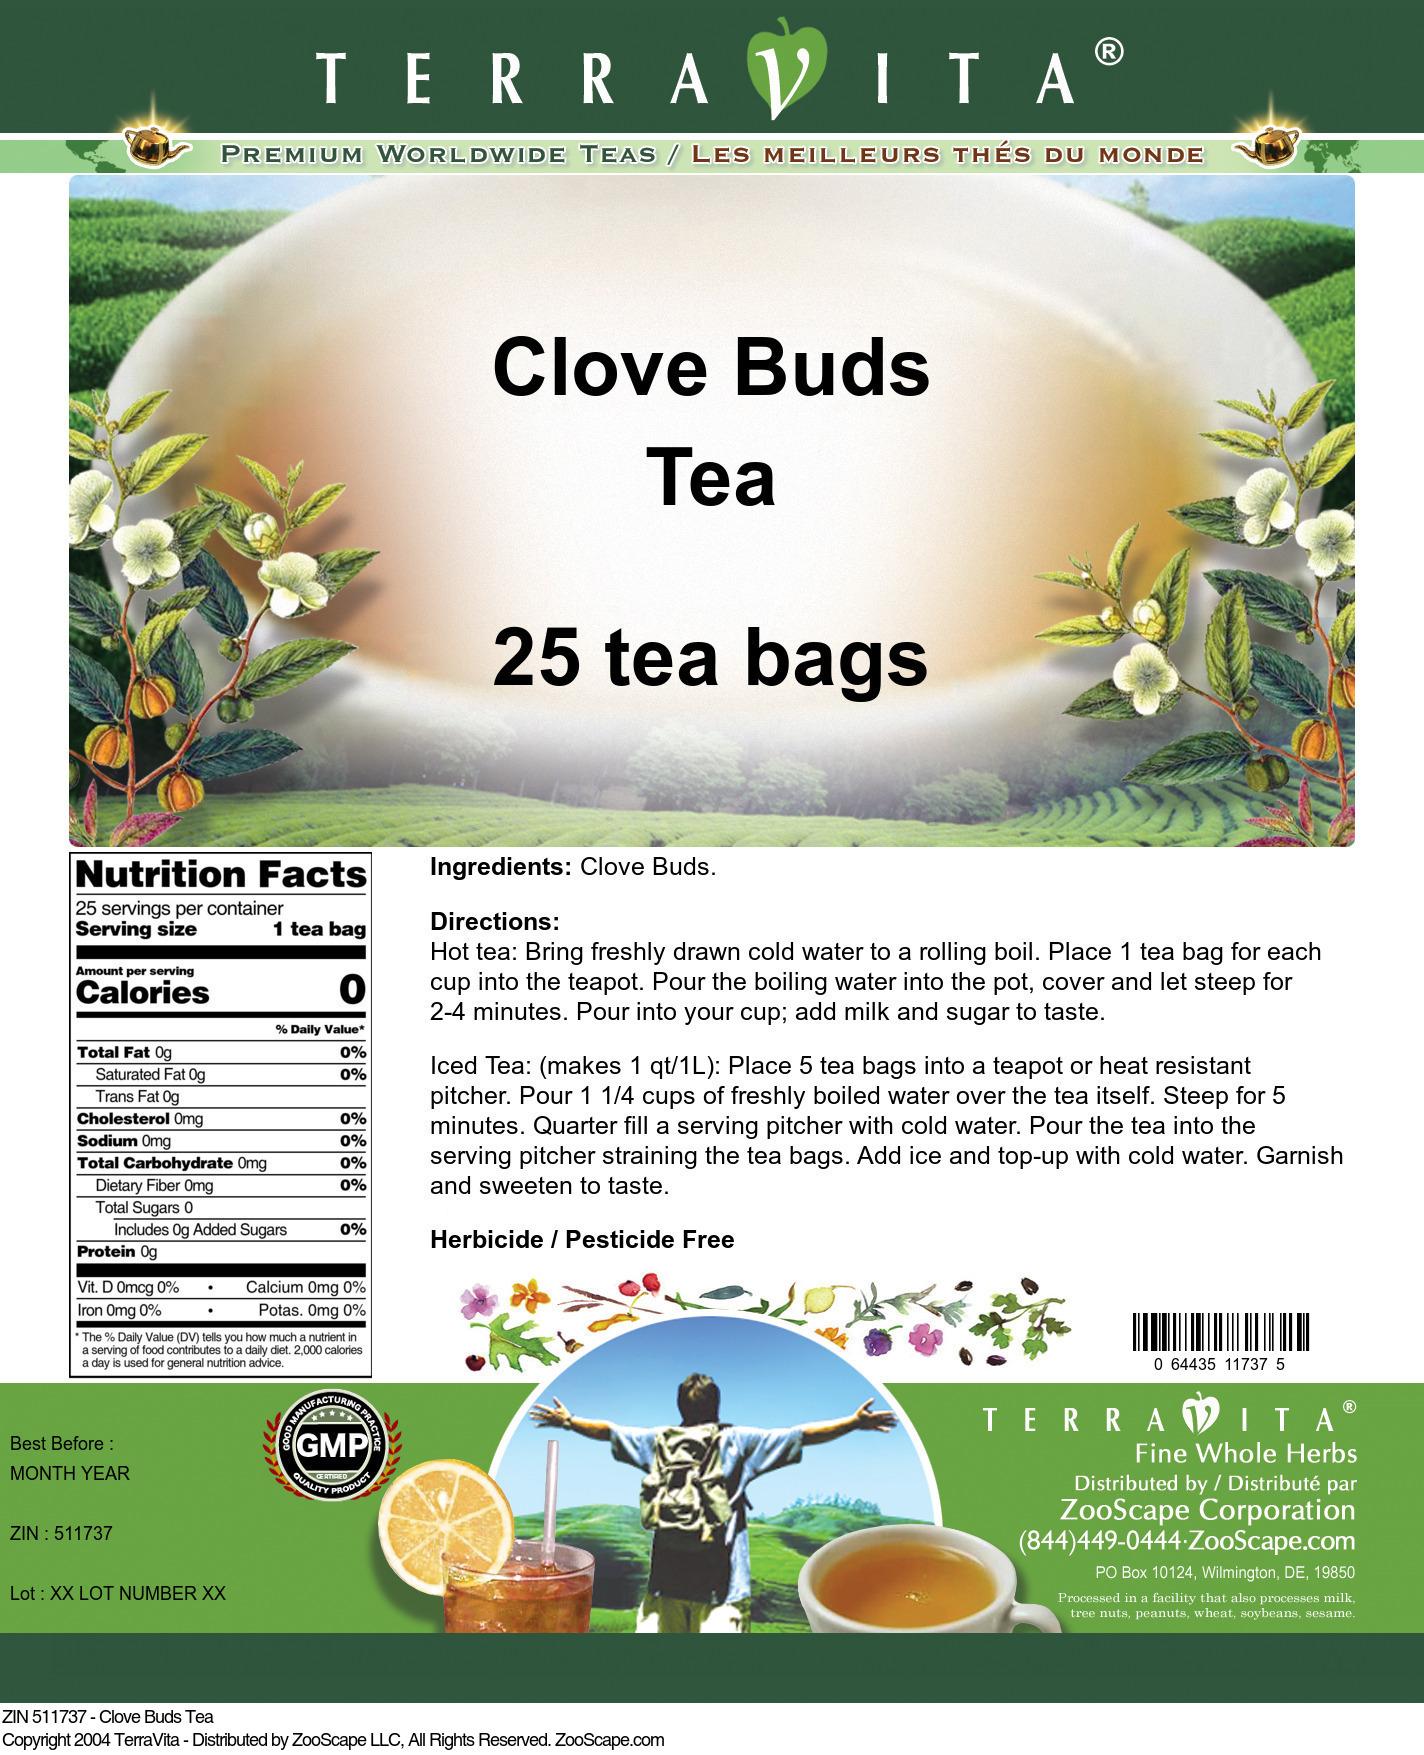 Clove Buds Tea